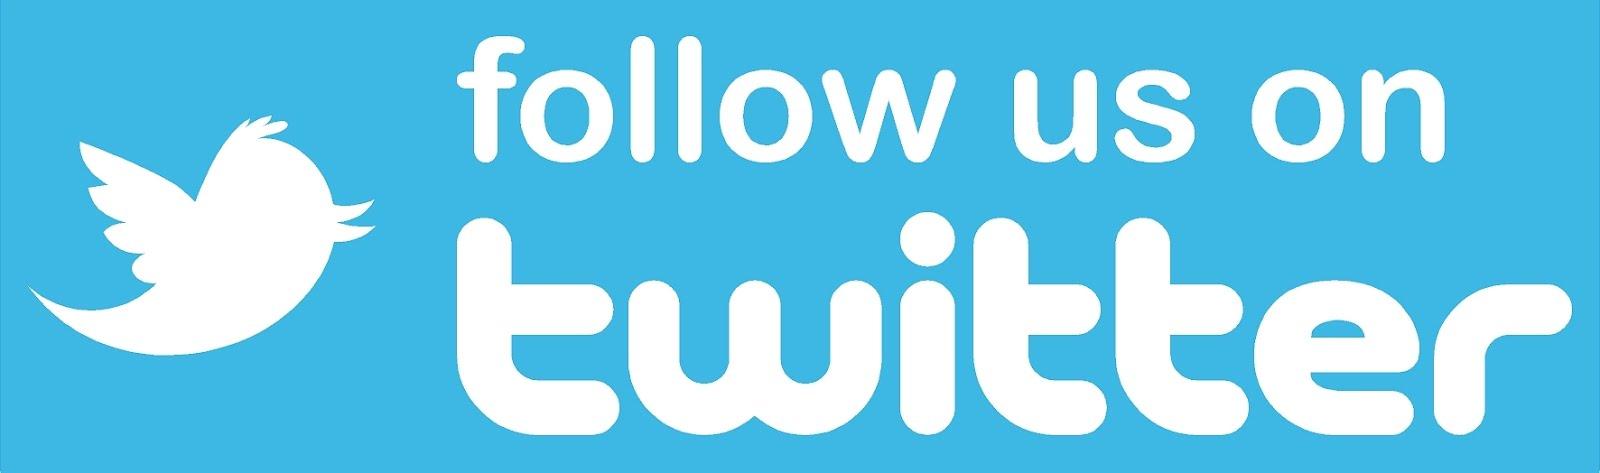 Get Our Tweets